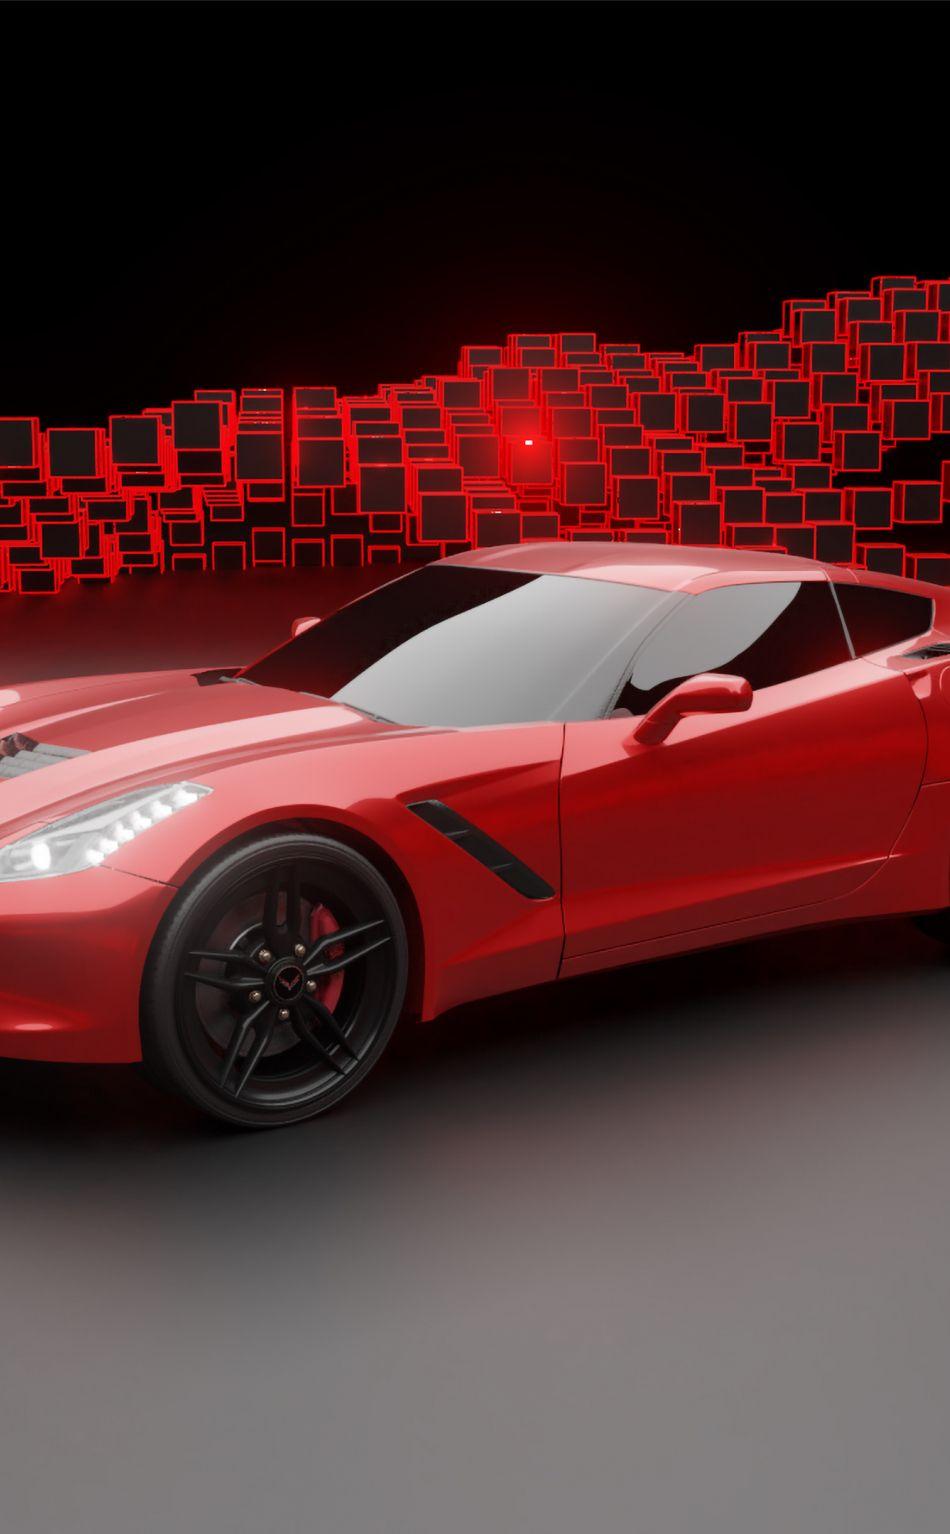 Corvette Stingray Dark Wallpaper Iphone Wallpapers Iphonewallpaper4k Iphonewallpaperfal Dark Wallpaper Iphone Corvette Stingray Black Hd Wallpaper Iphone